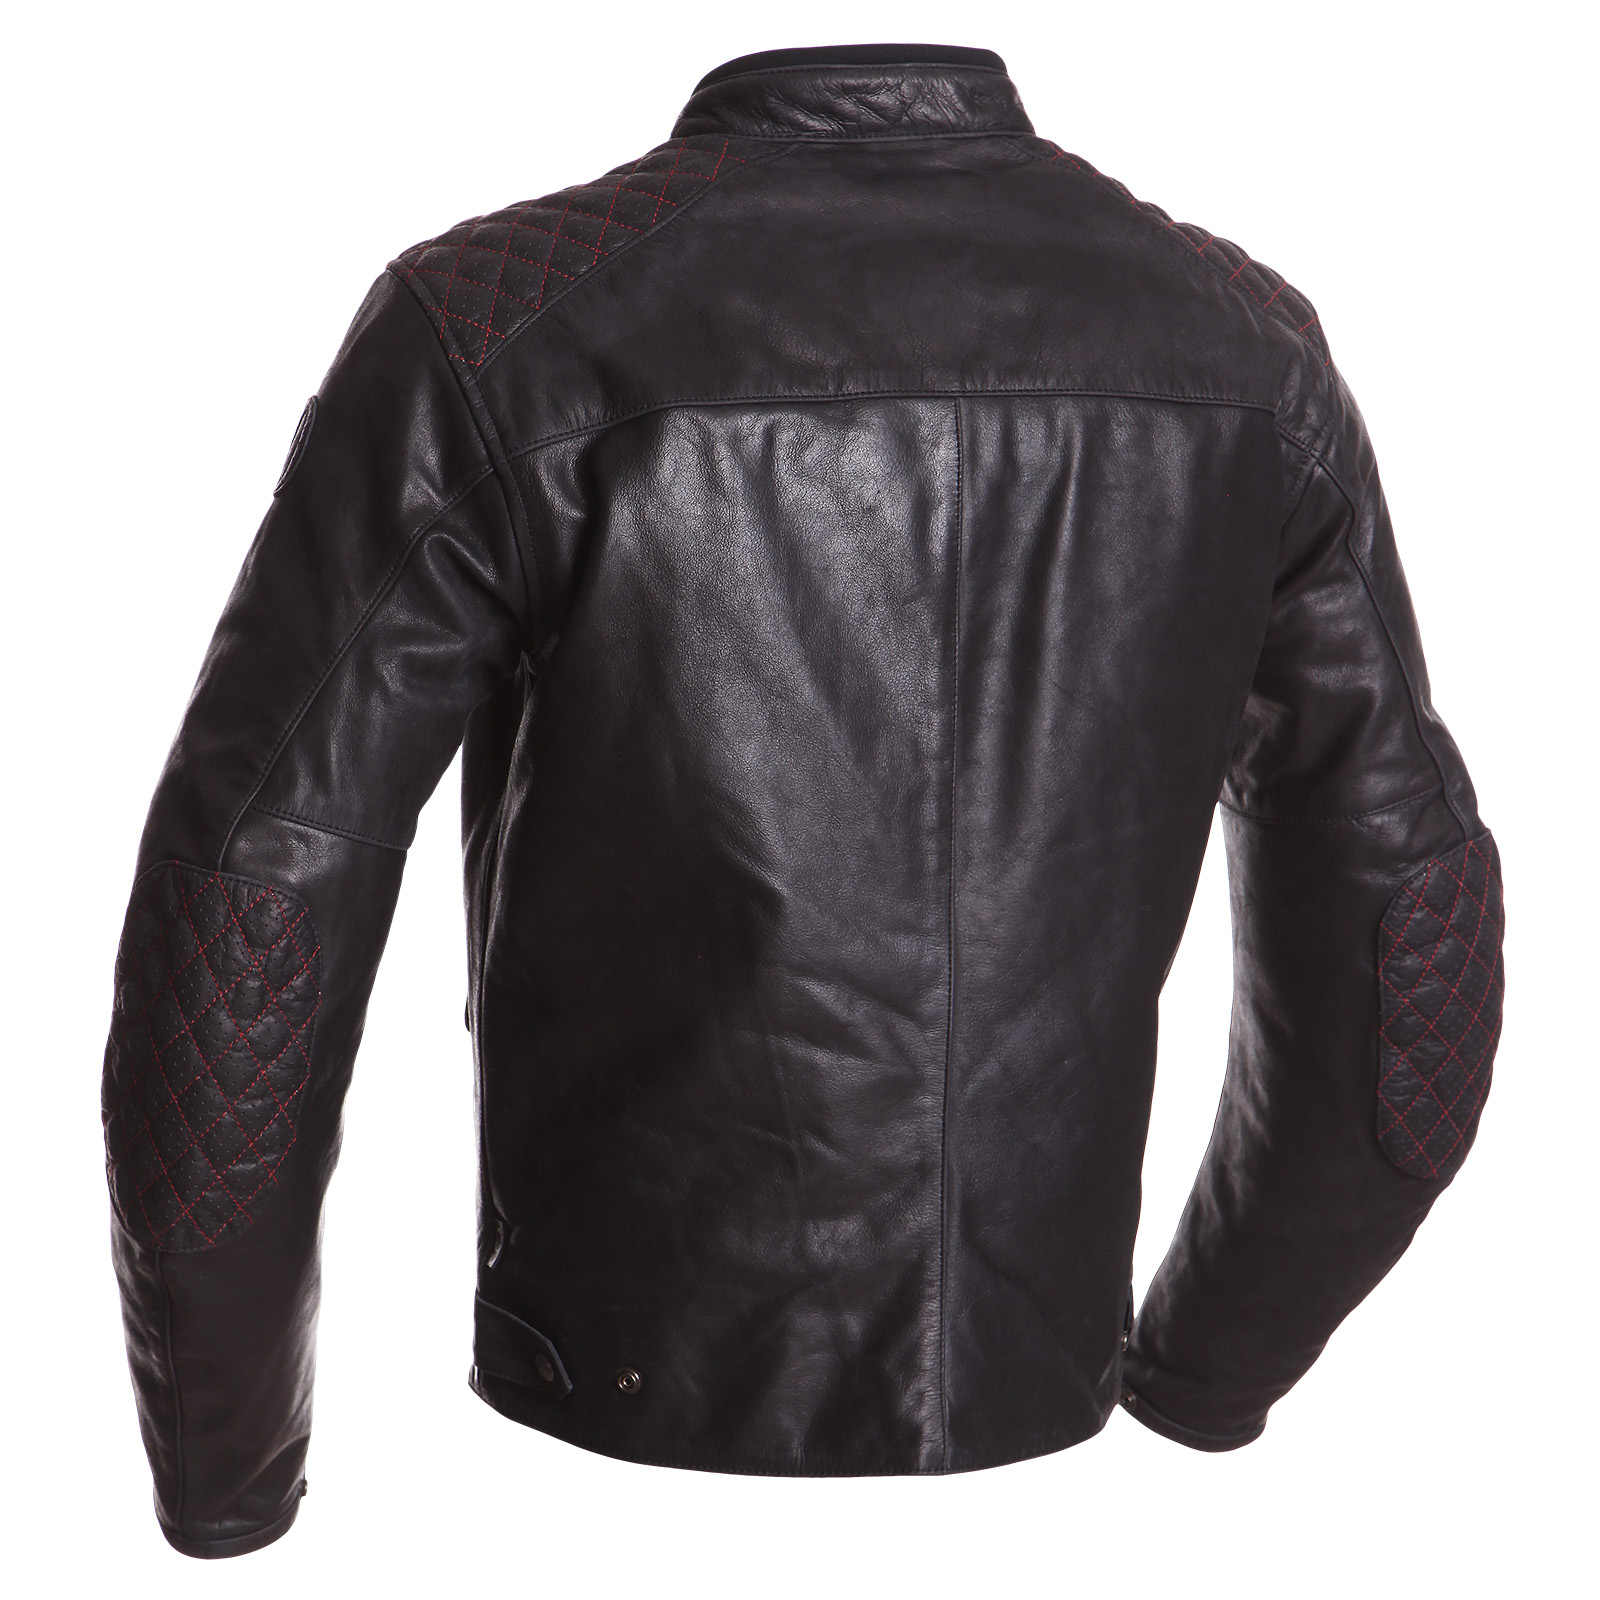 Boomer SCB1313 Bőrdzseki Segura motoros ruházat Fokt